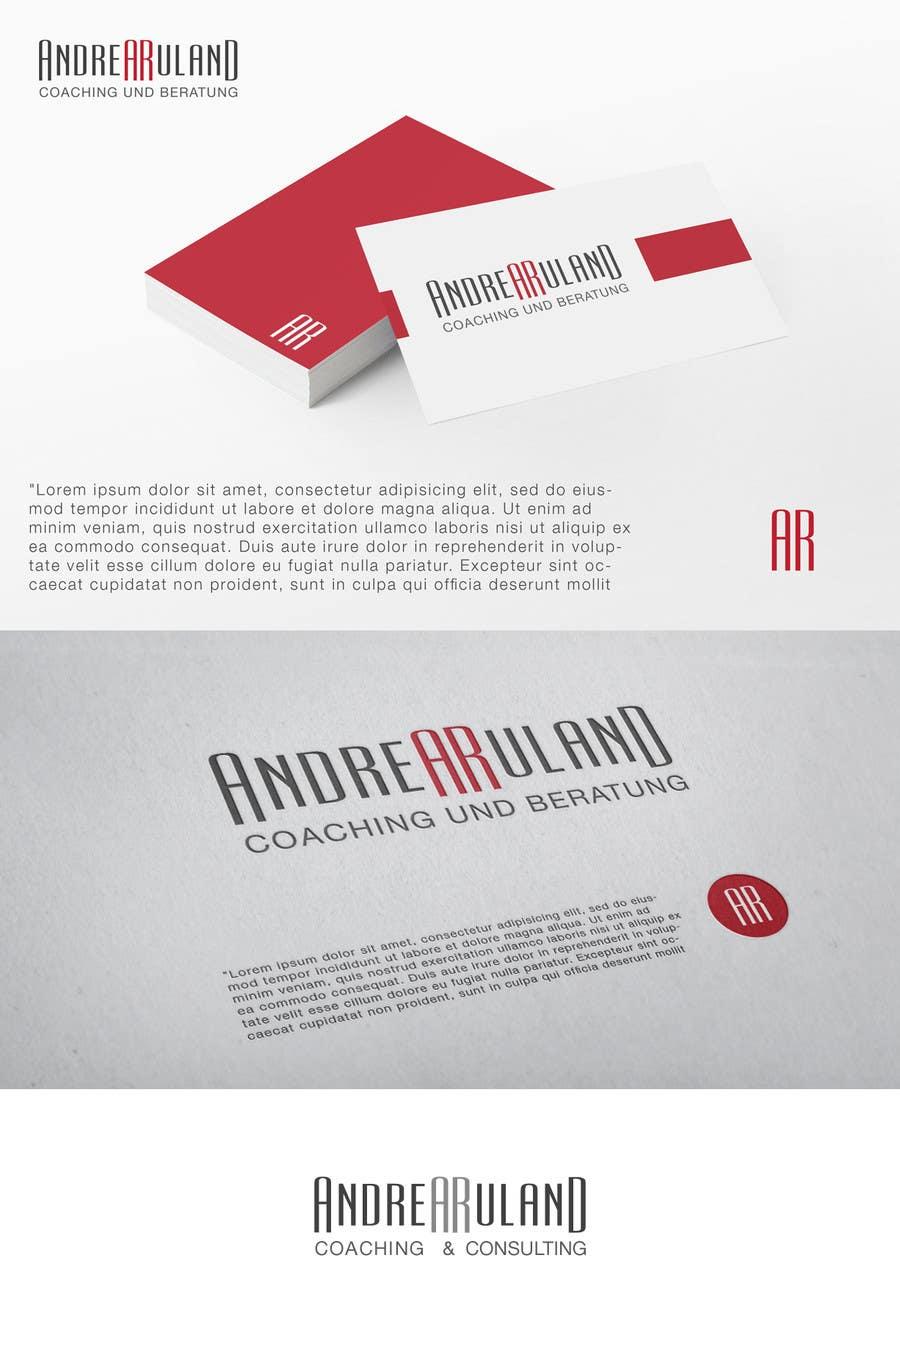 Bài tham dự cuộc thi #                                        24                                      cho                                         Design a Logo for Coaching and Consulting